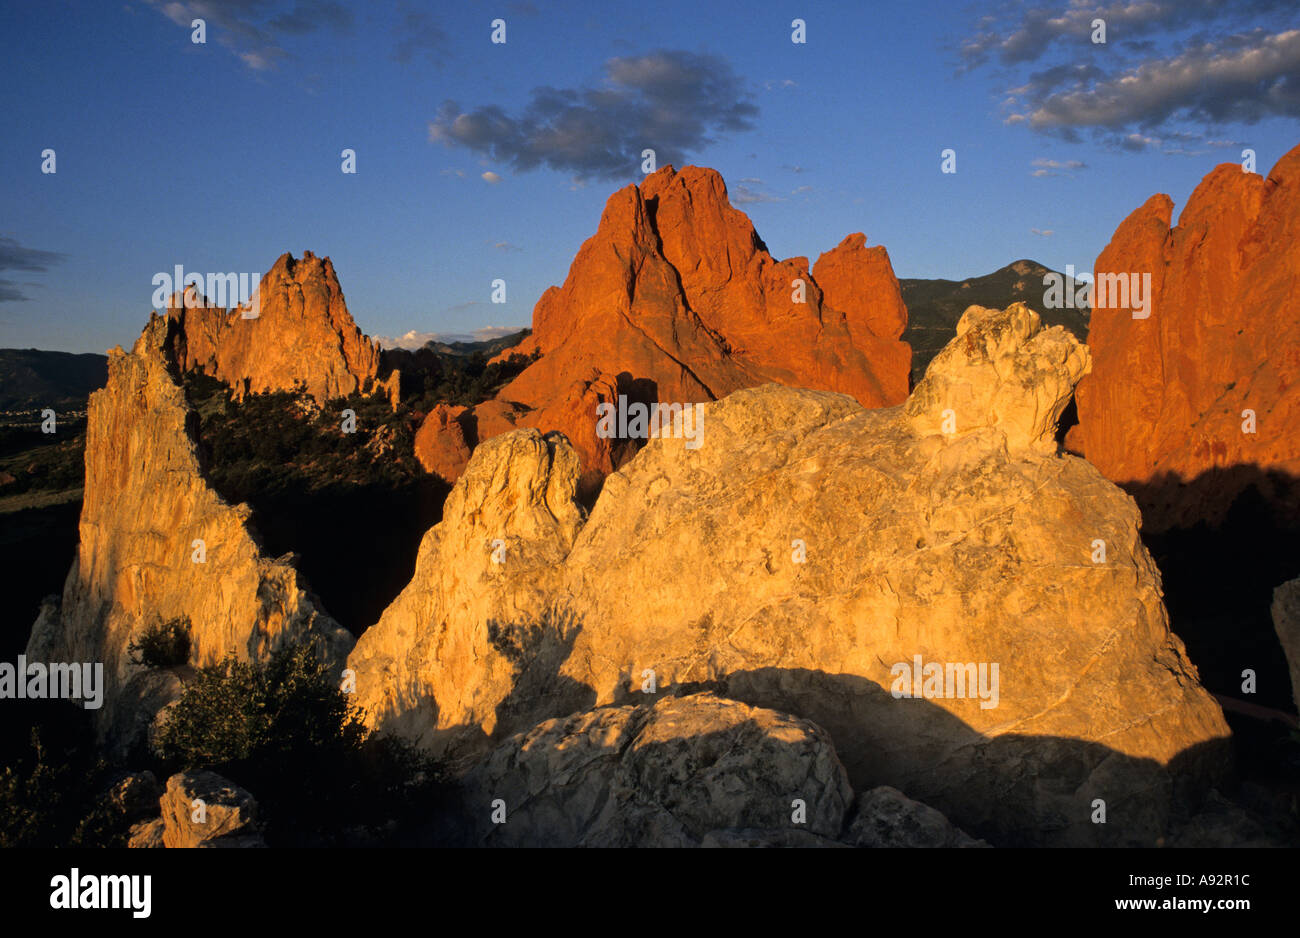 Sunrise on Garden of the Gods Colorado Springs Colorado United States - Stock Image